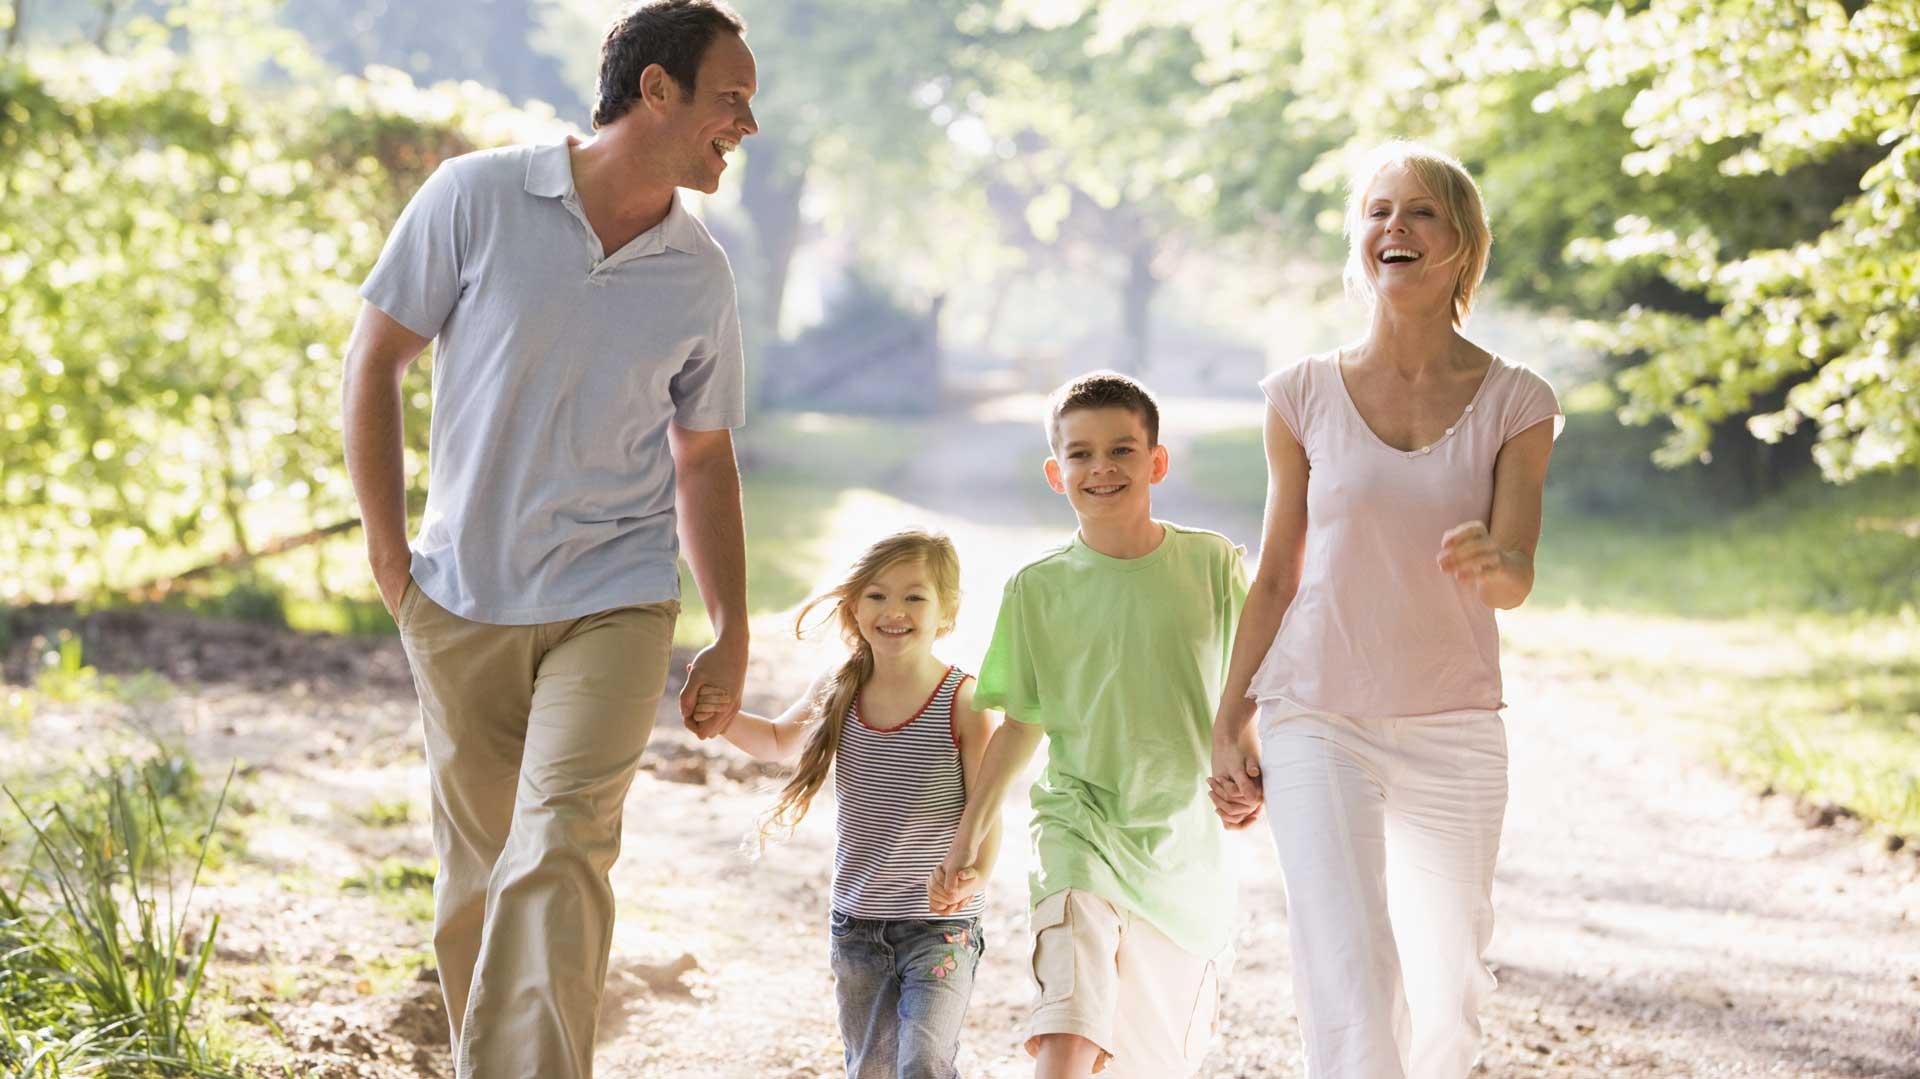 Дети гуляют с родителями картинки